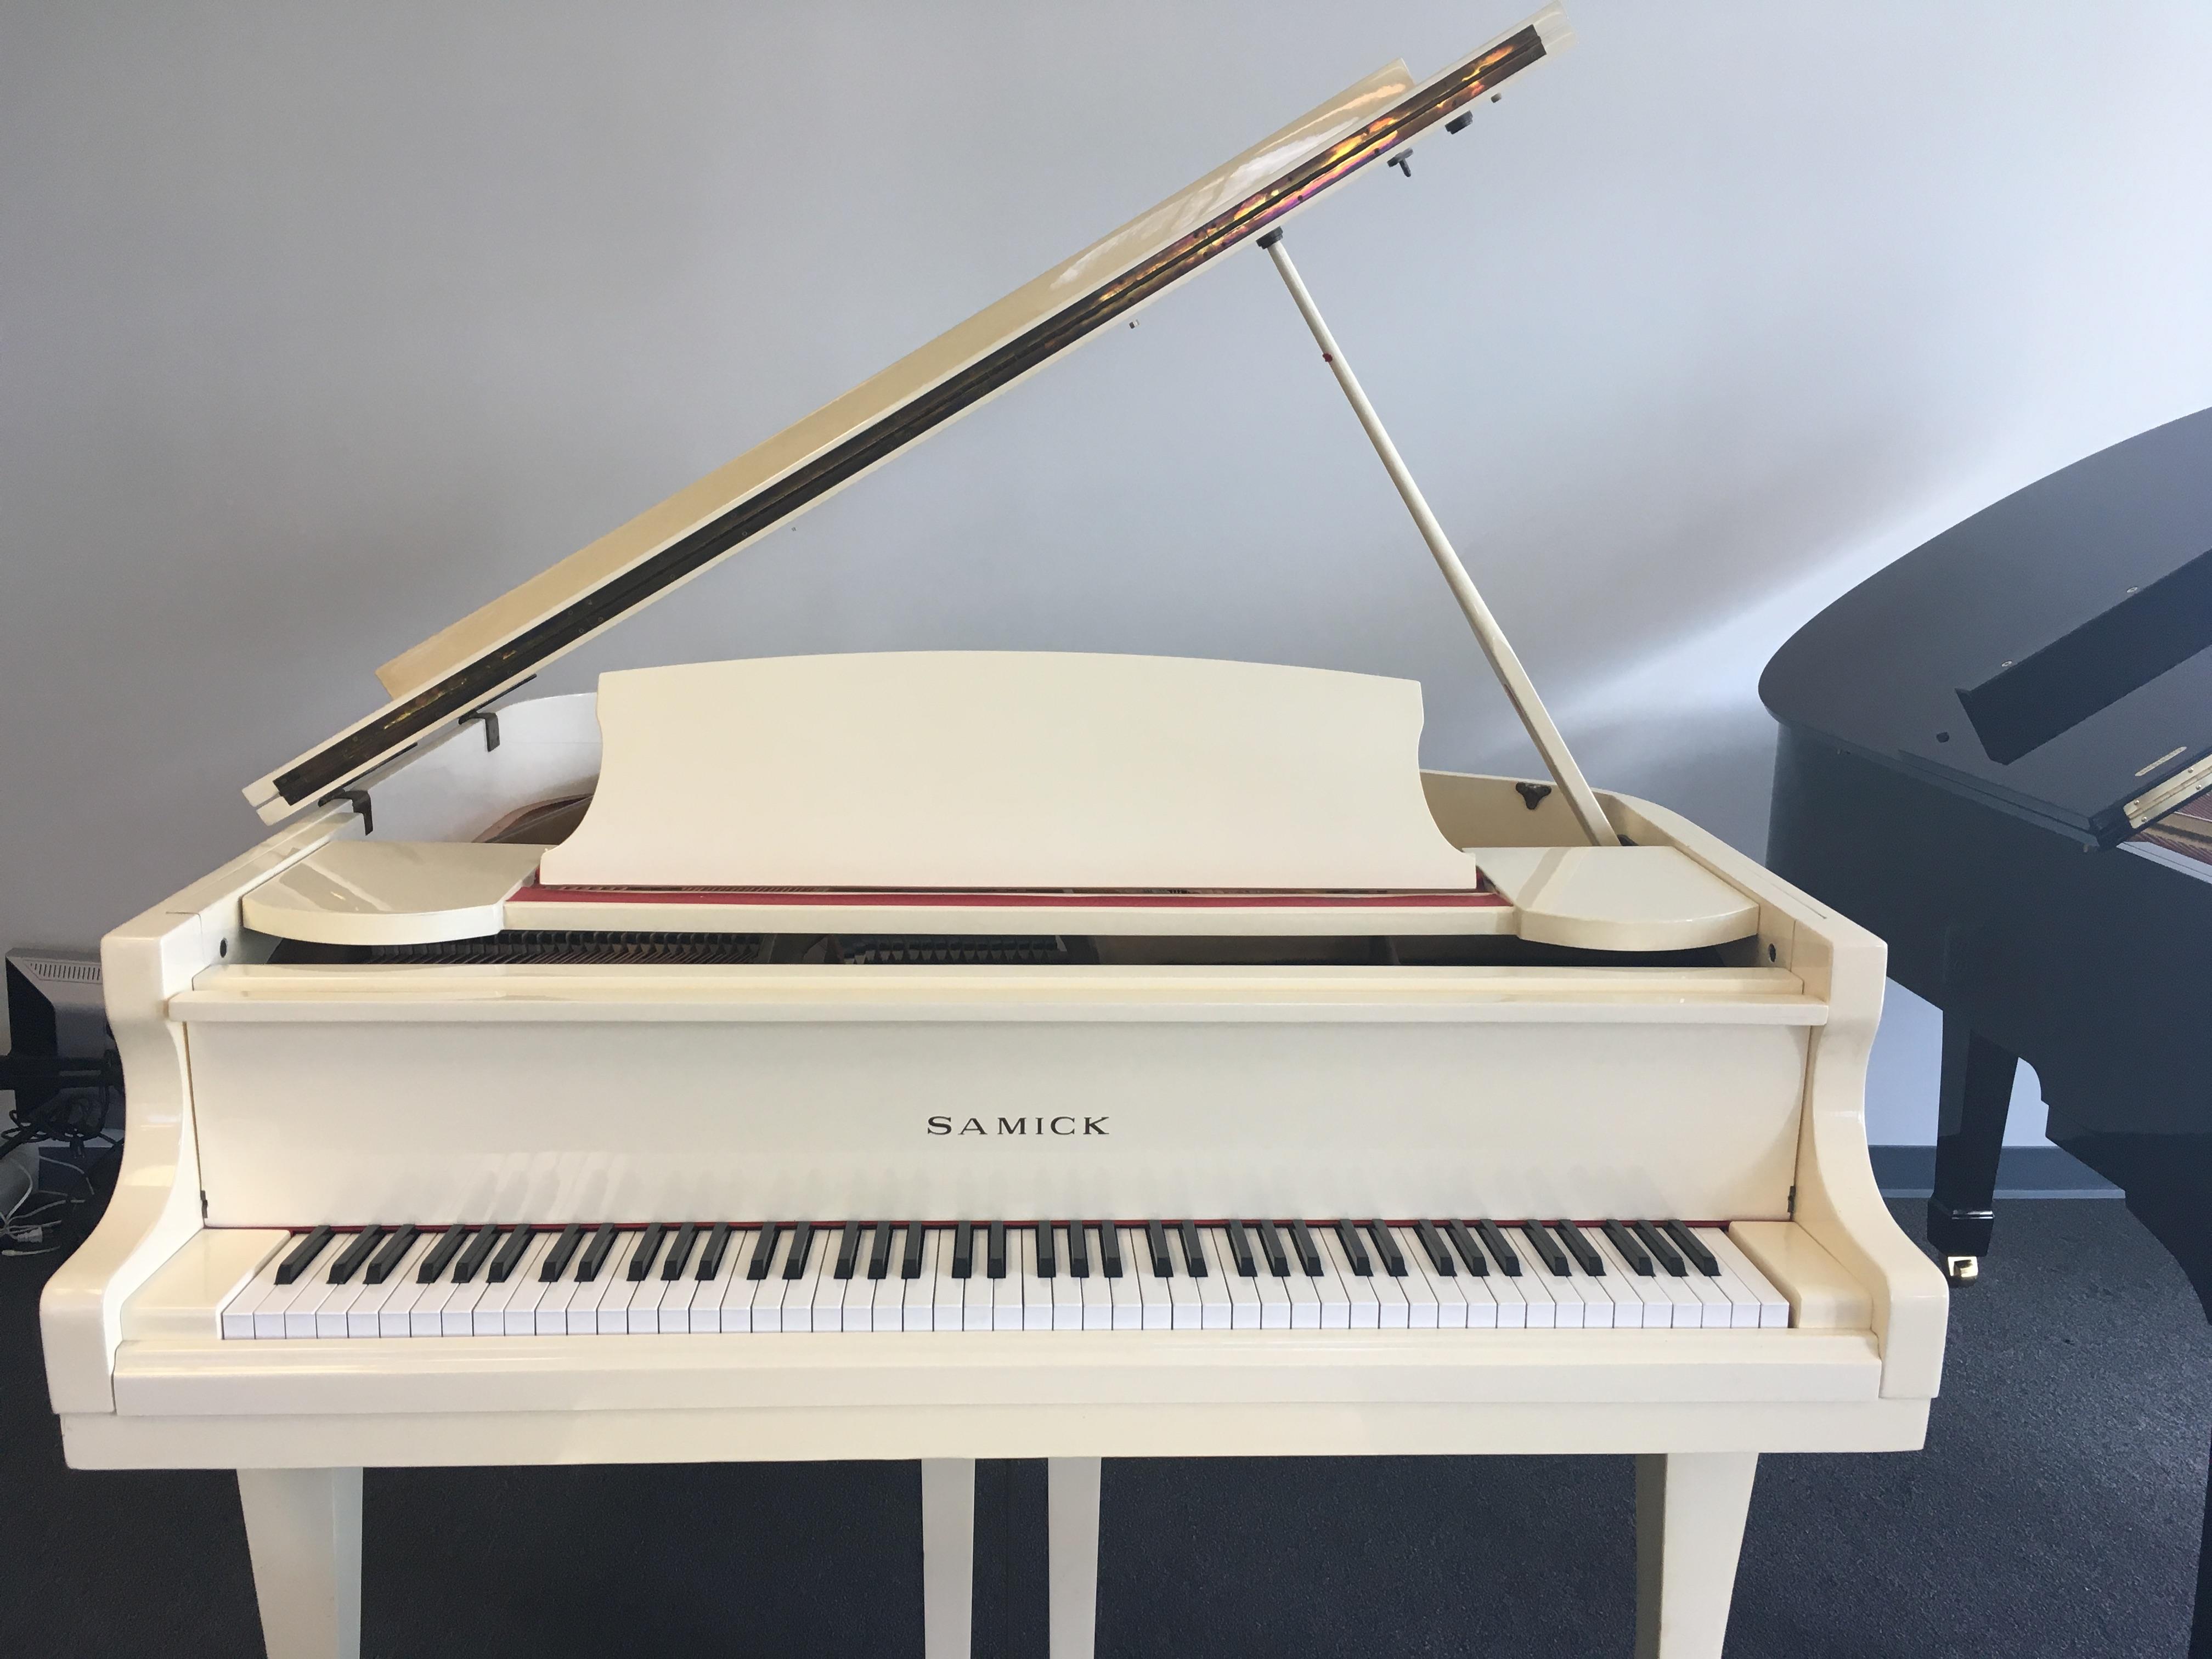 Samick Piano | England Piano